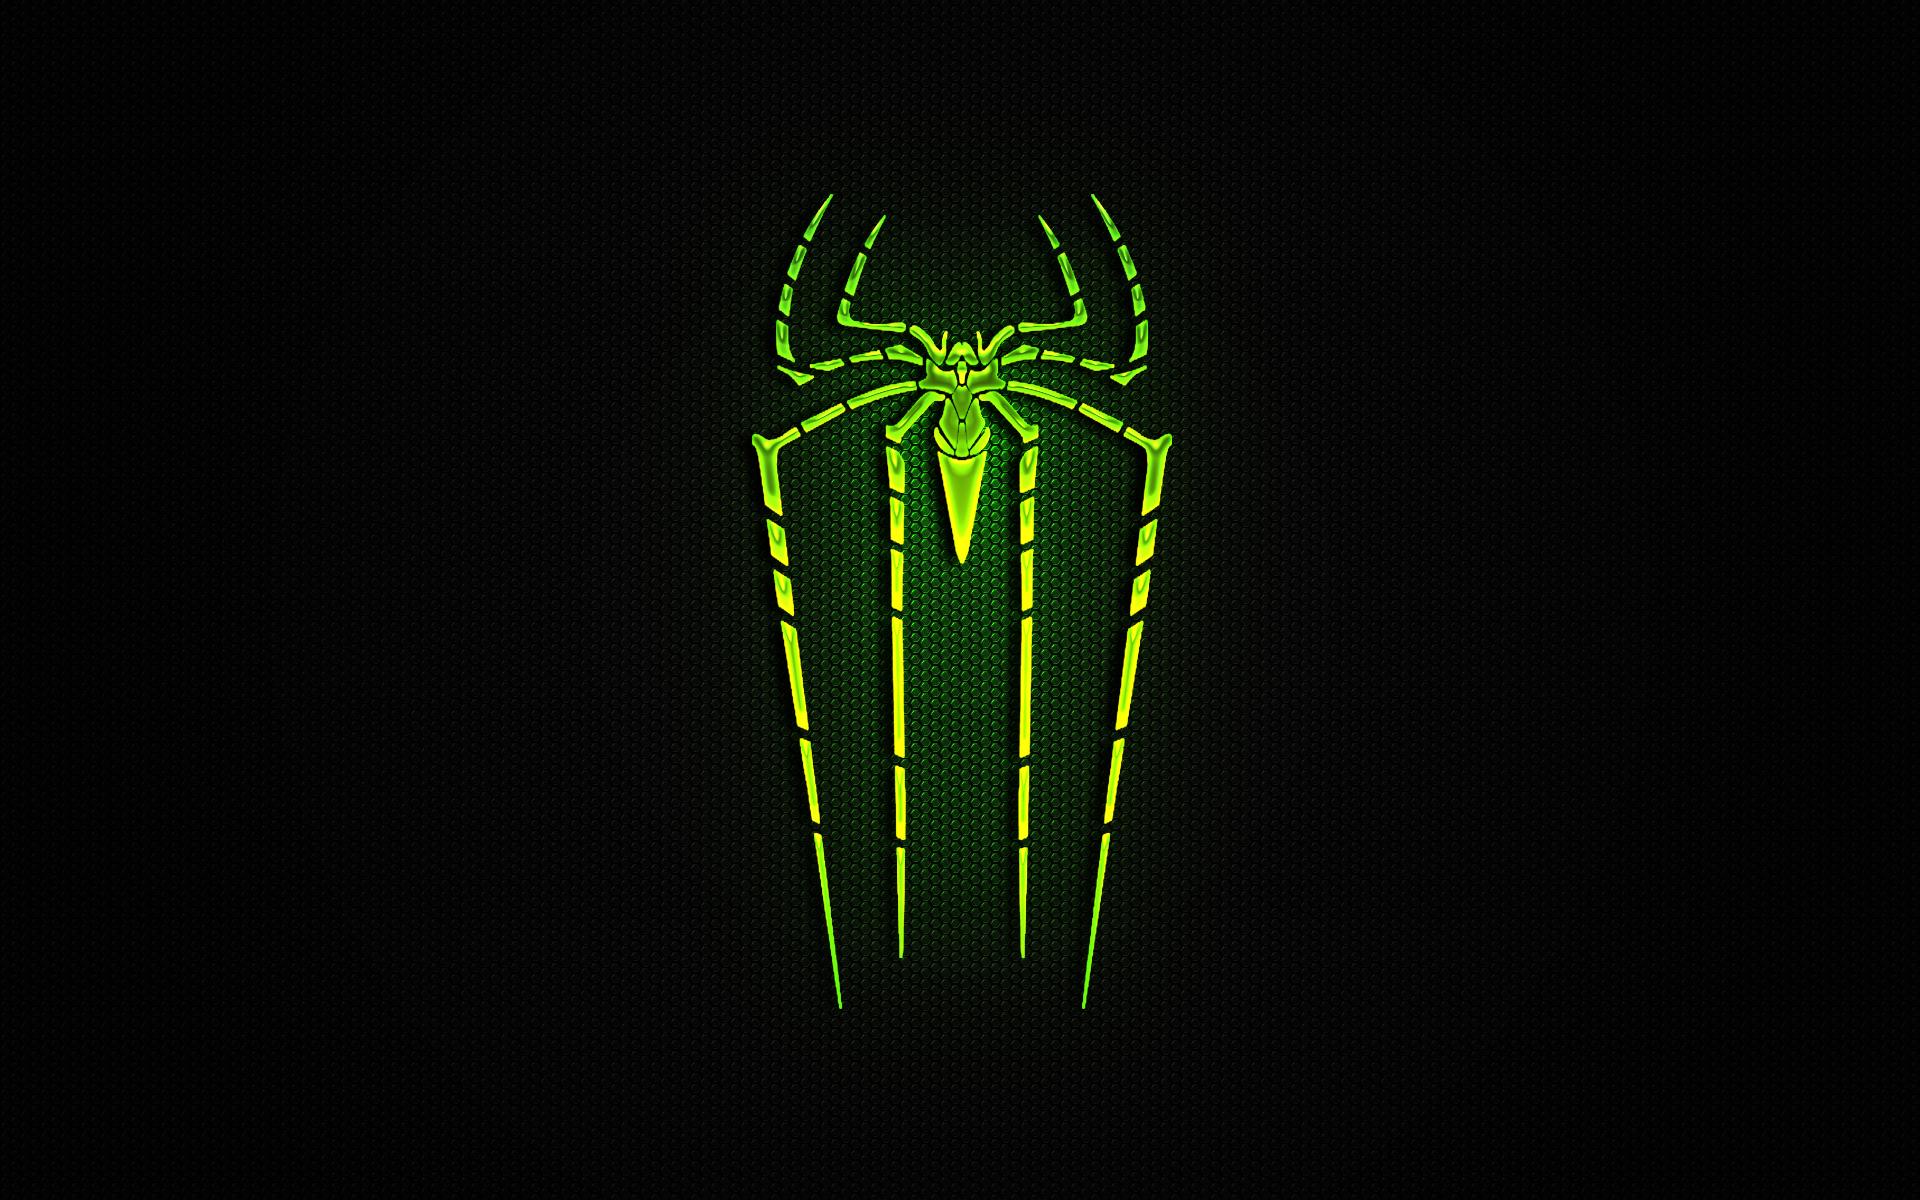 Amazing spider man logo wallpaper - photo#13